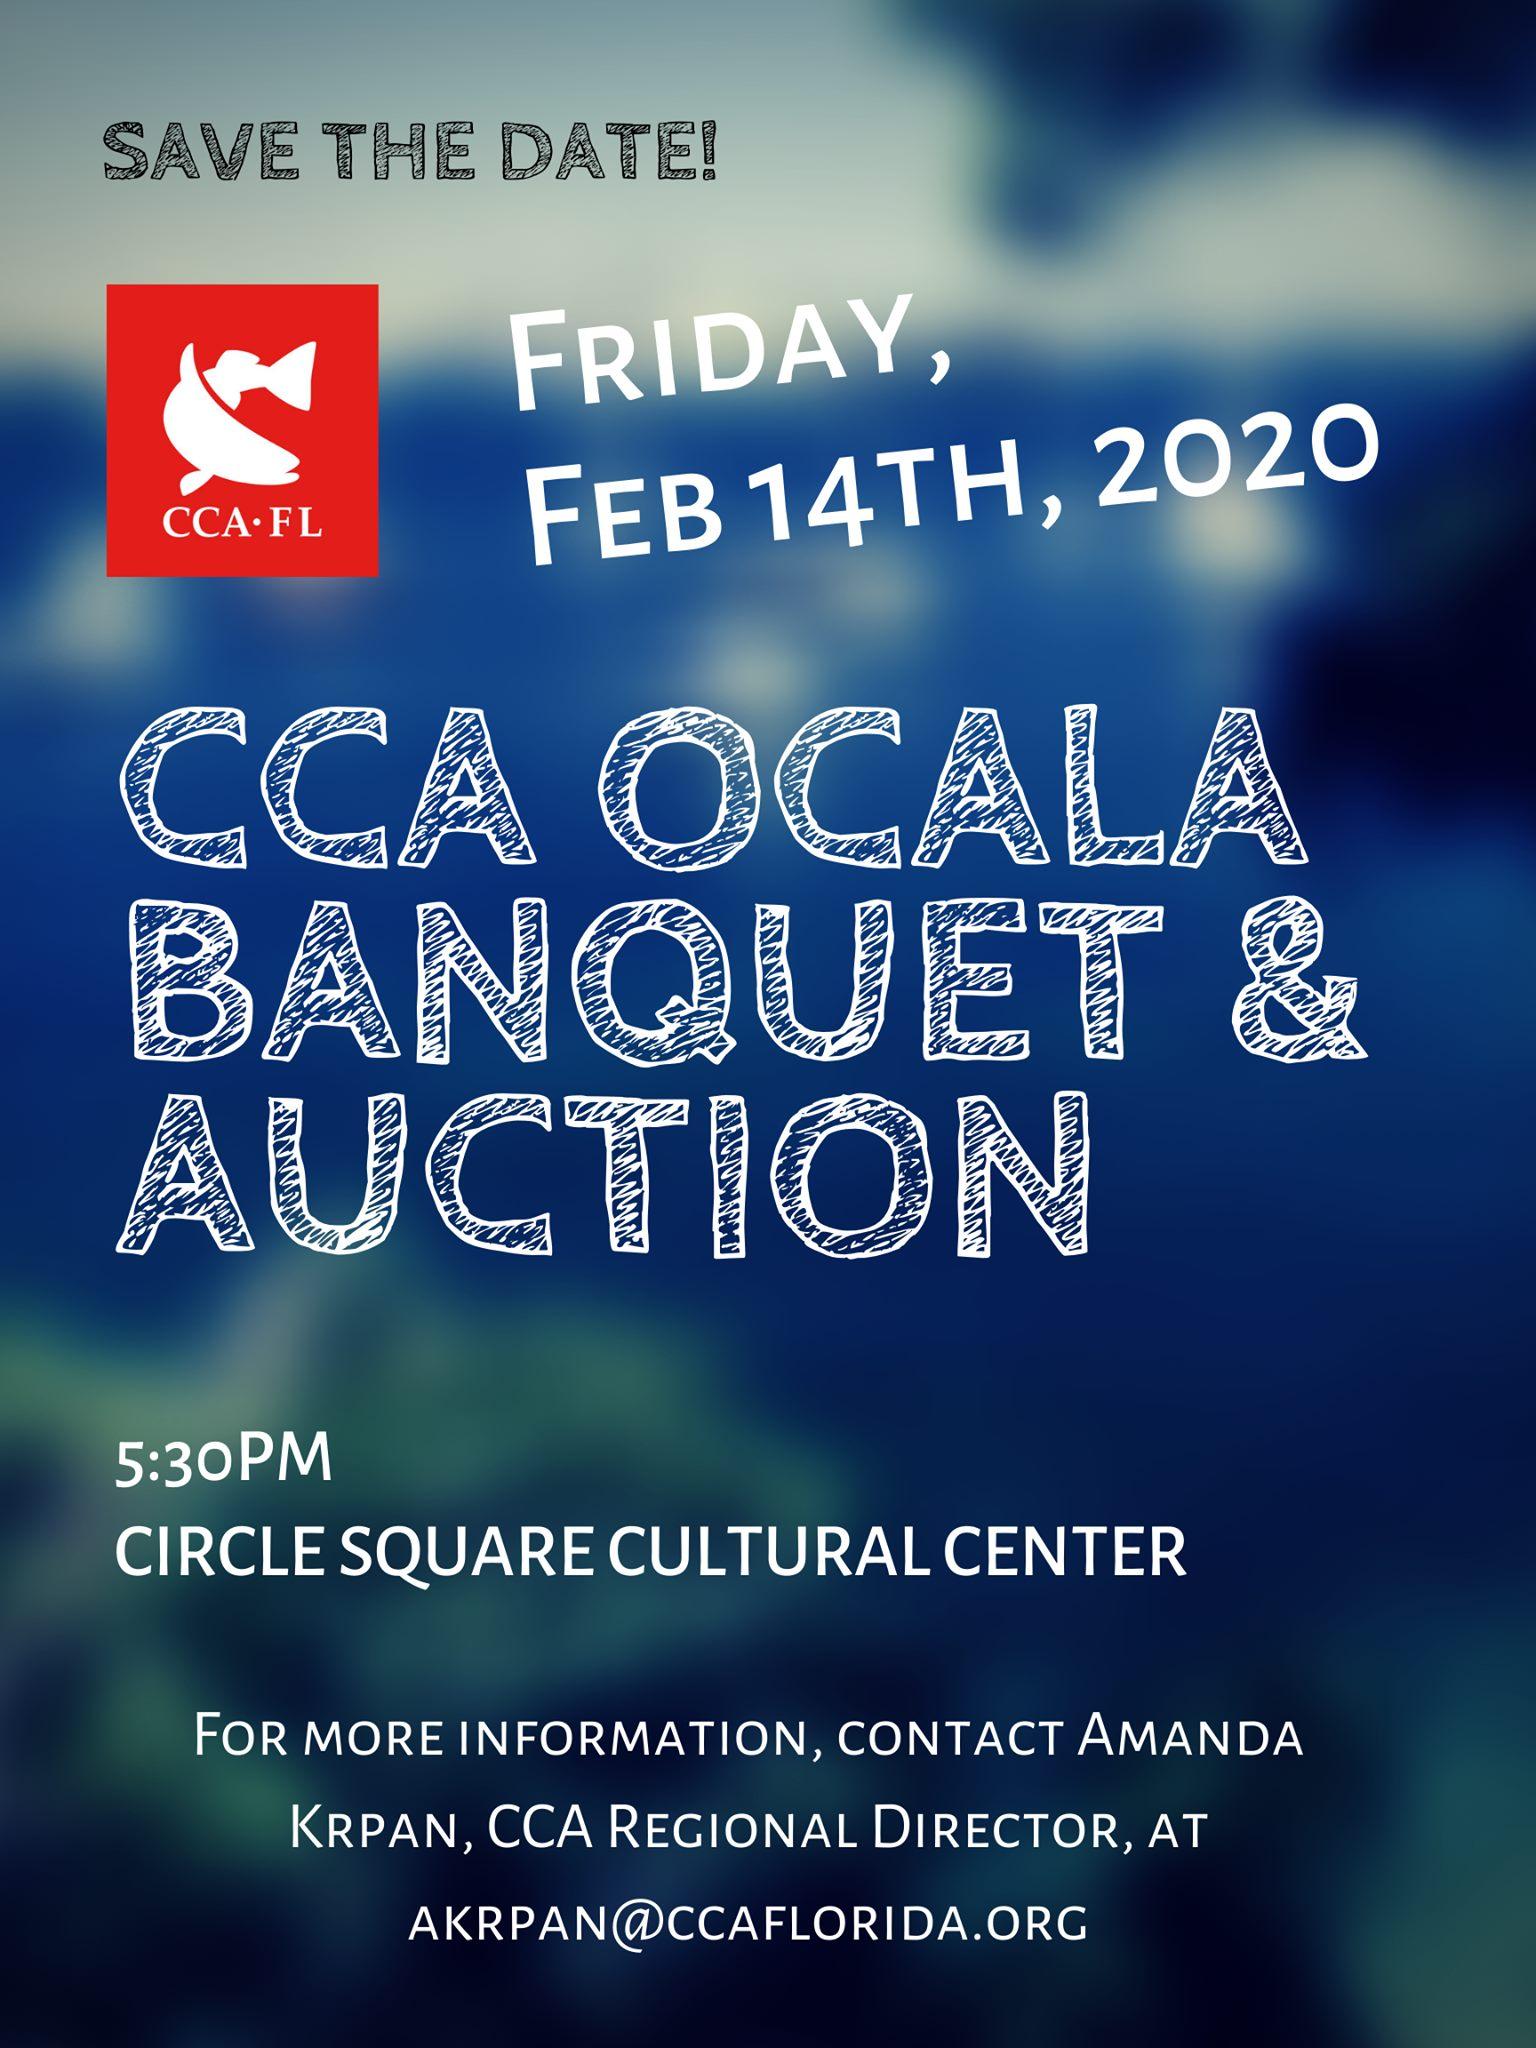 CCA Ocala Banquet & Auction, Feb. 14th, 2020